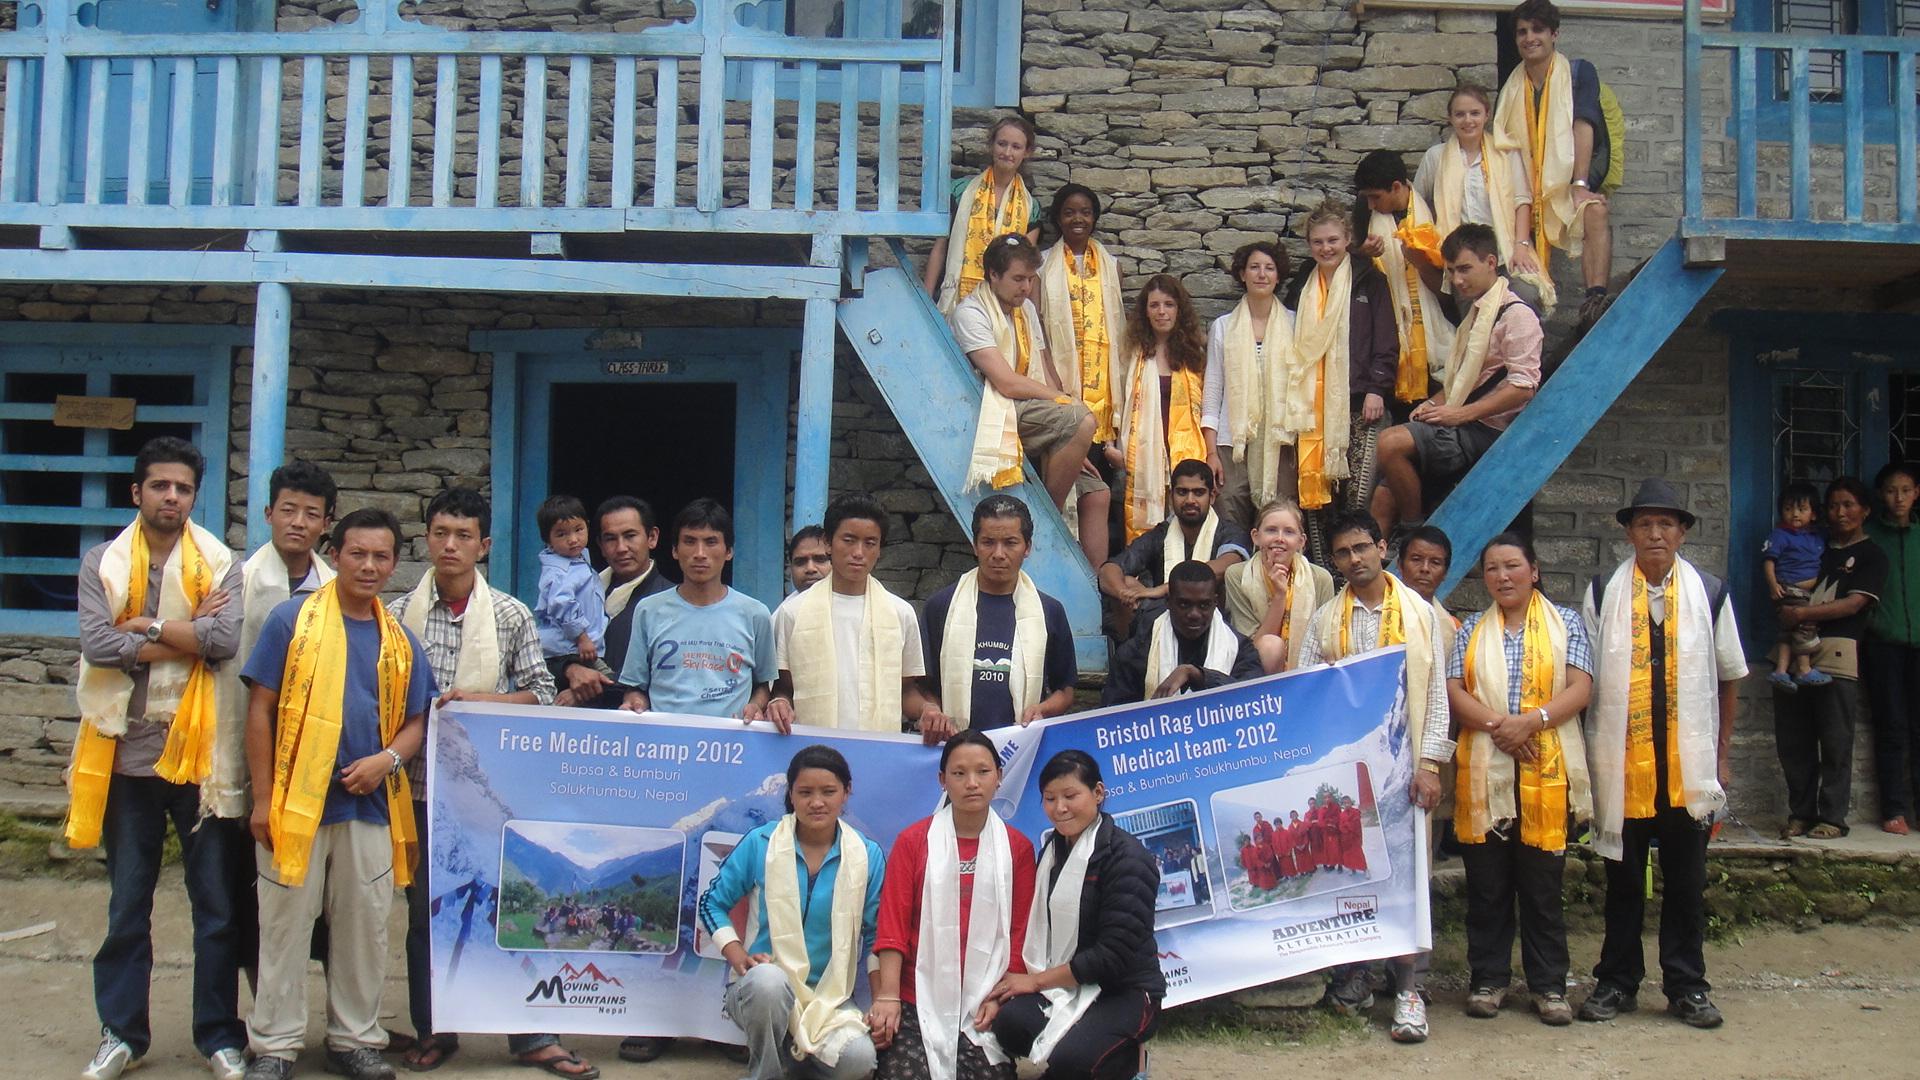 Medical_Volunteering_Team_Adventure_Alternative_Nepal.JPG